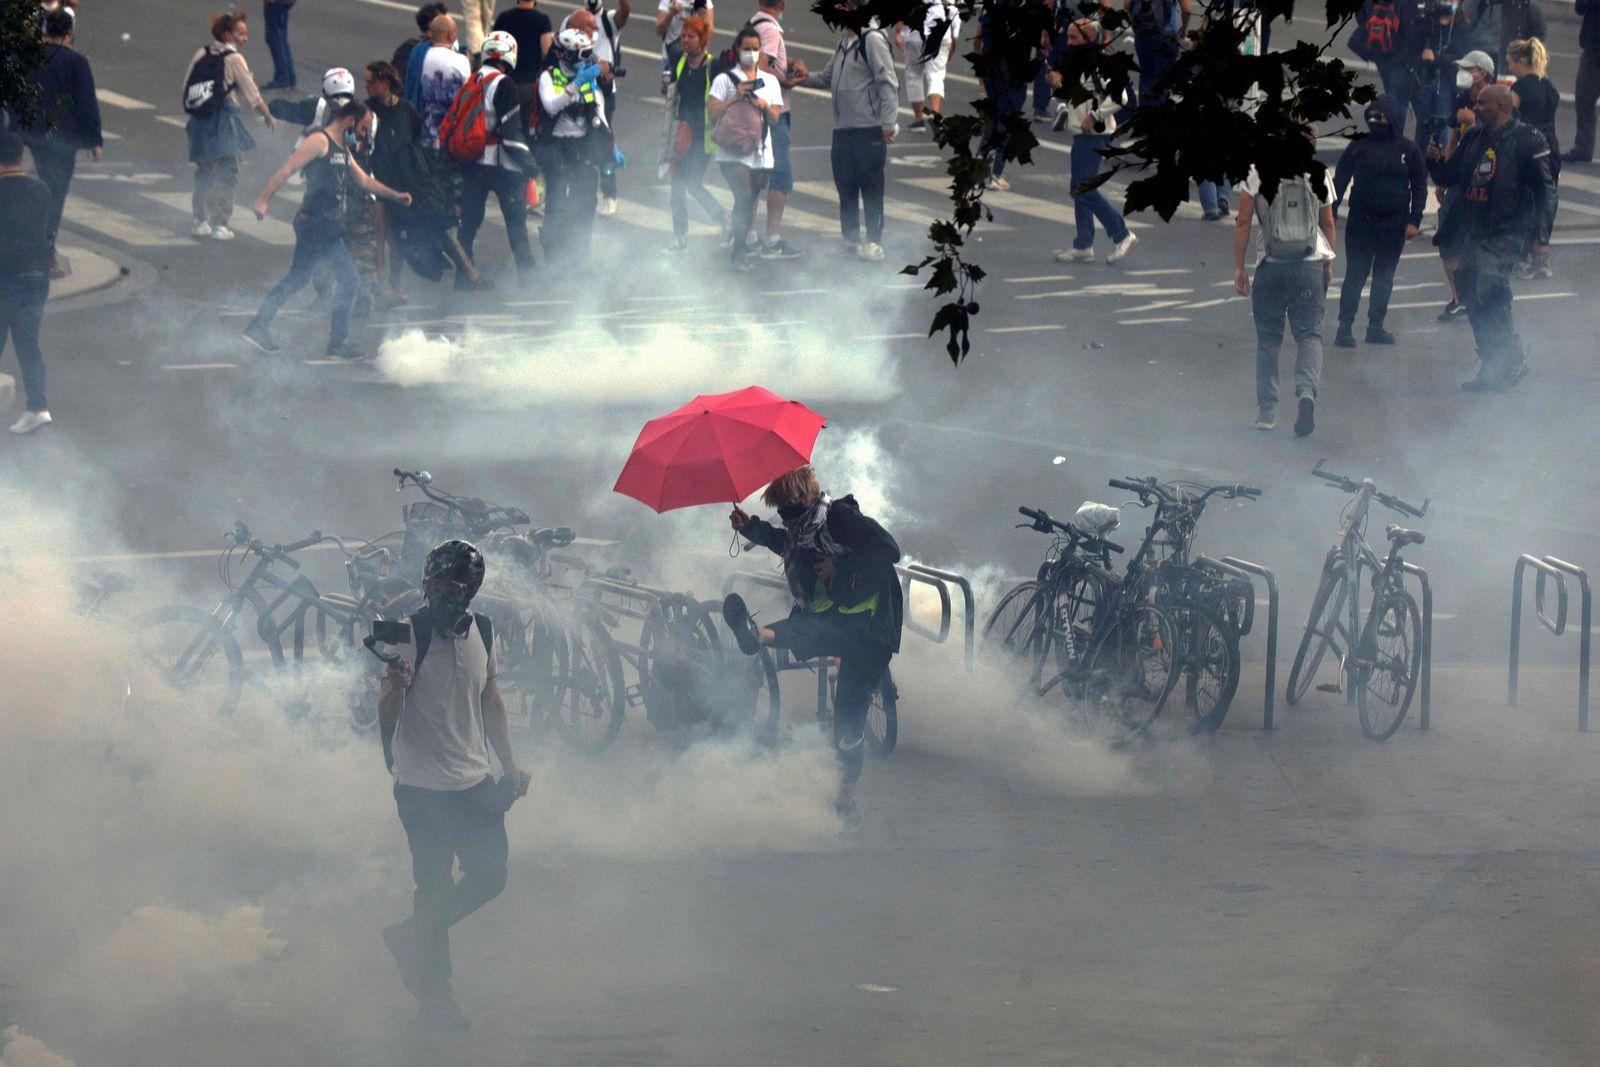 FRANCE-HEALTH-VIRUS-VACCINE-POLITICS-PROTEST